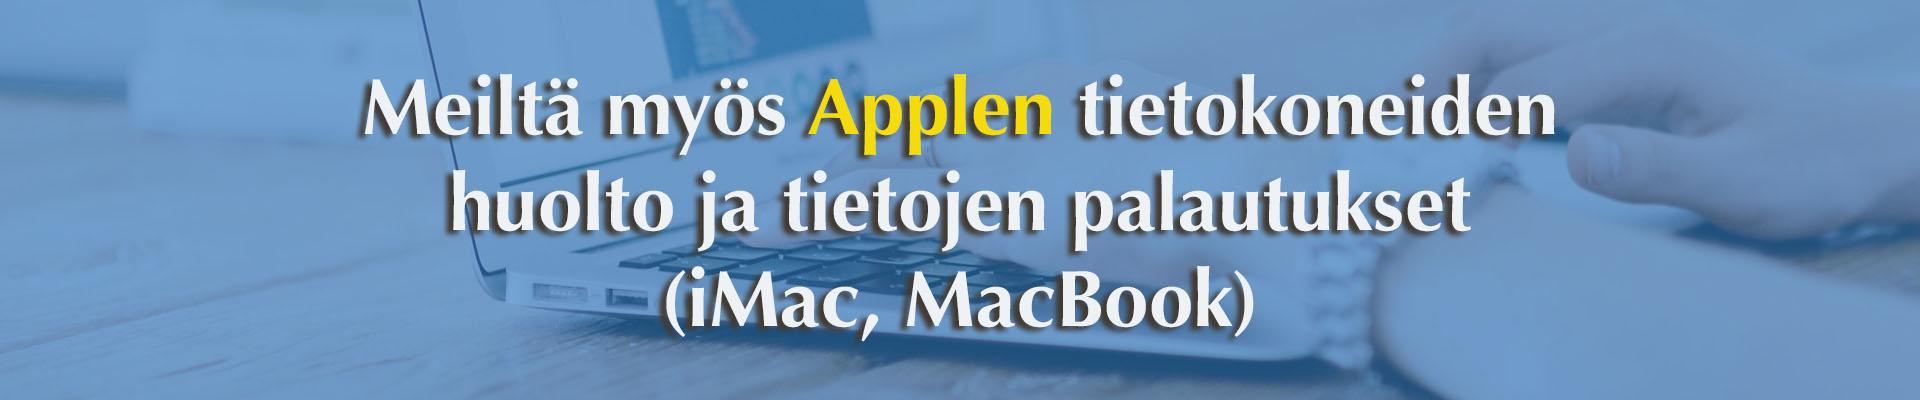 Mac-tietokonehuolto Tampereella